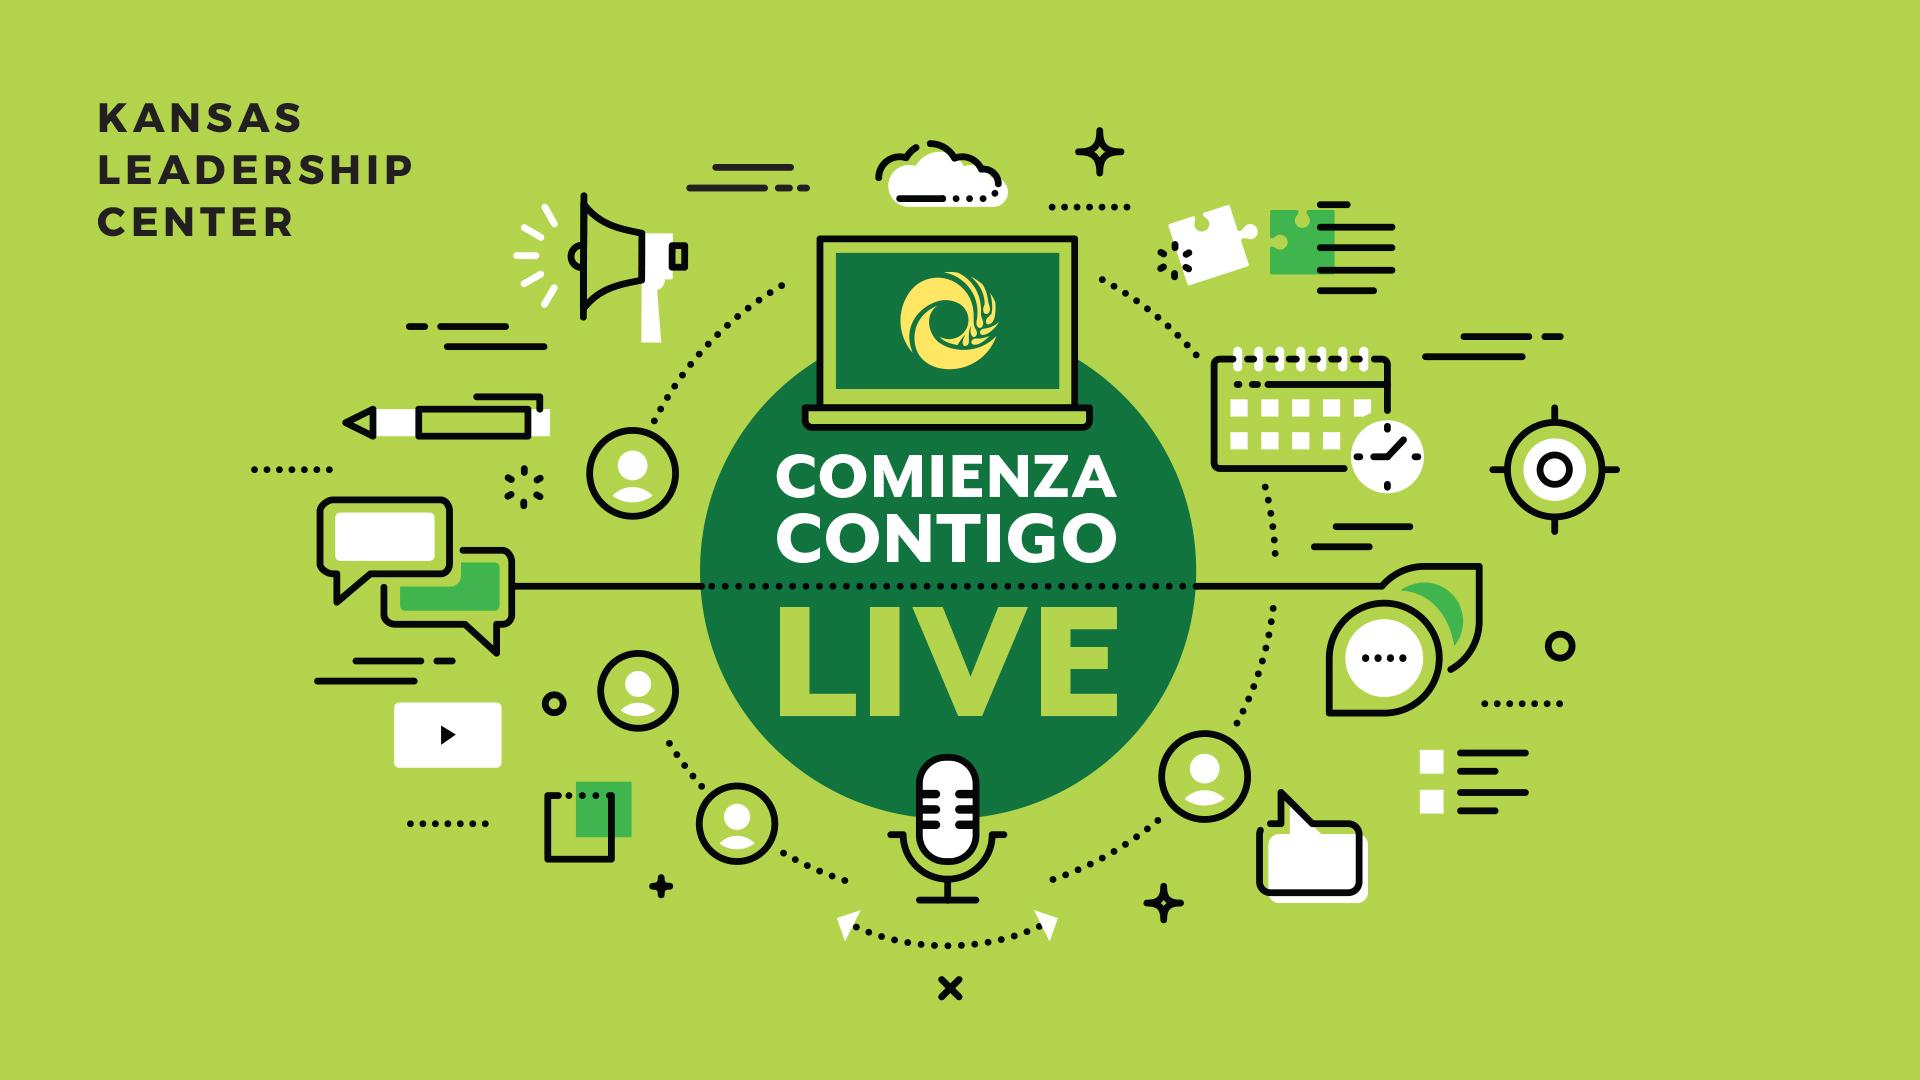 Comienza Contigo LIVE Green graphic